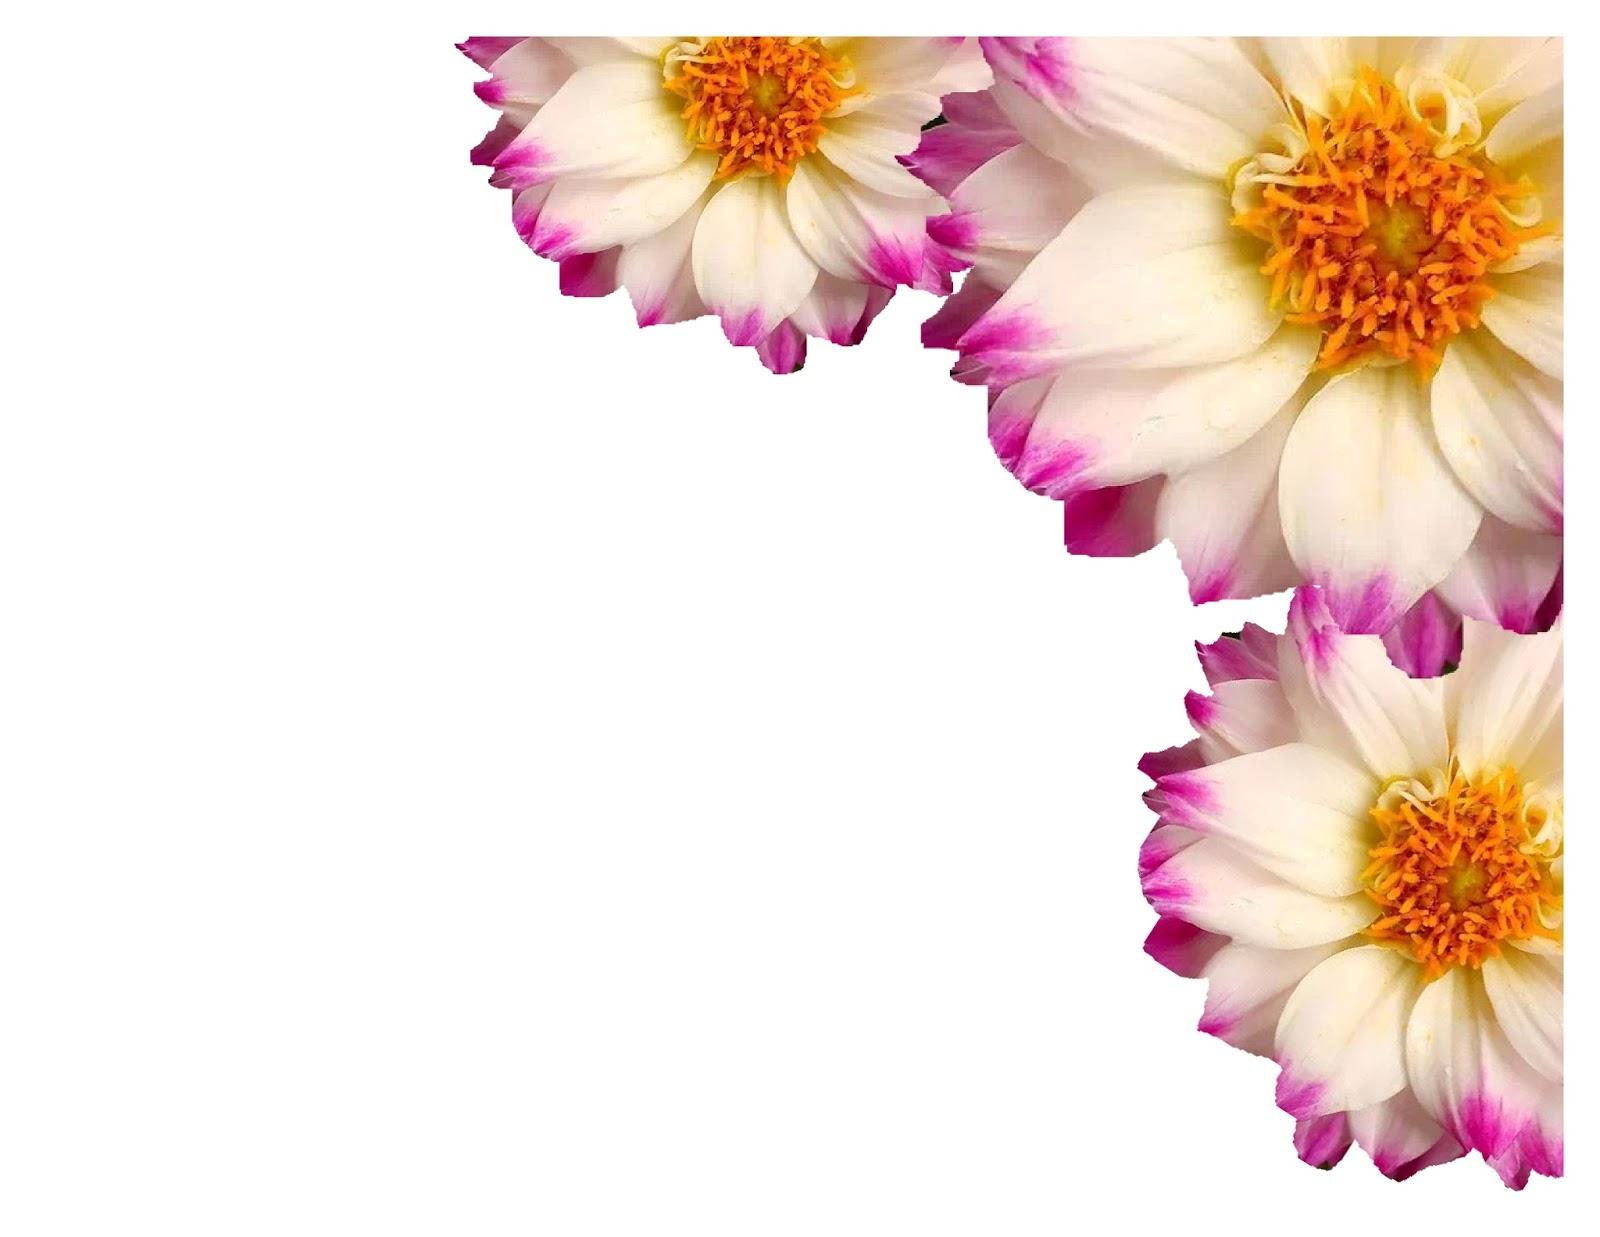 flower wallpaper floral border - photo #28